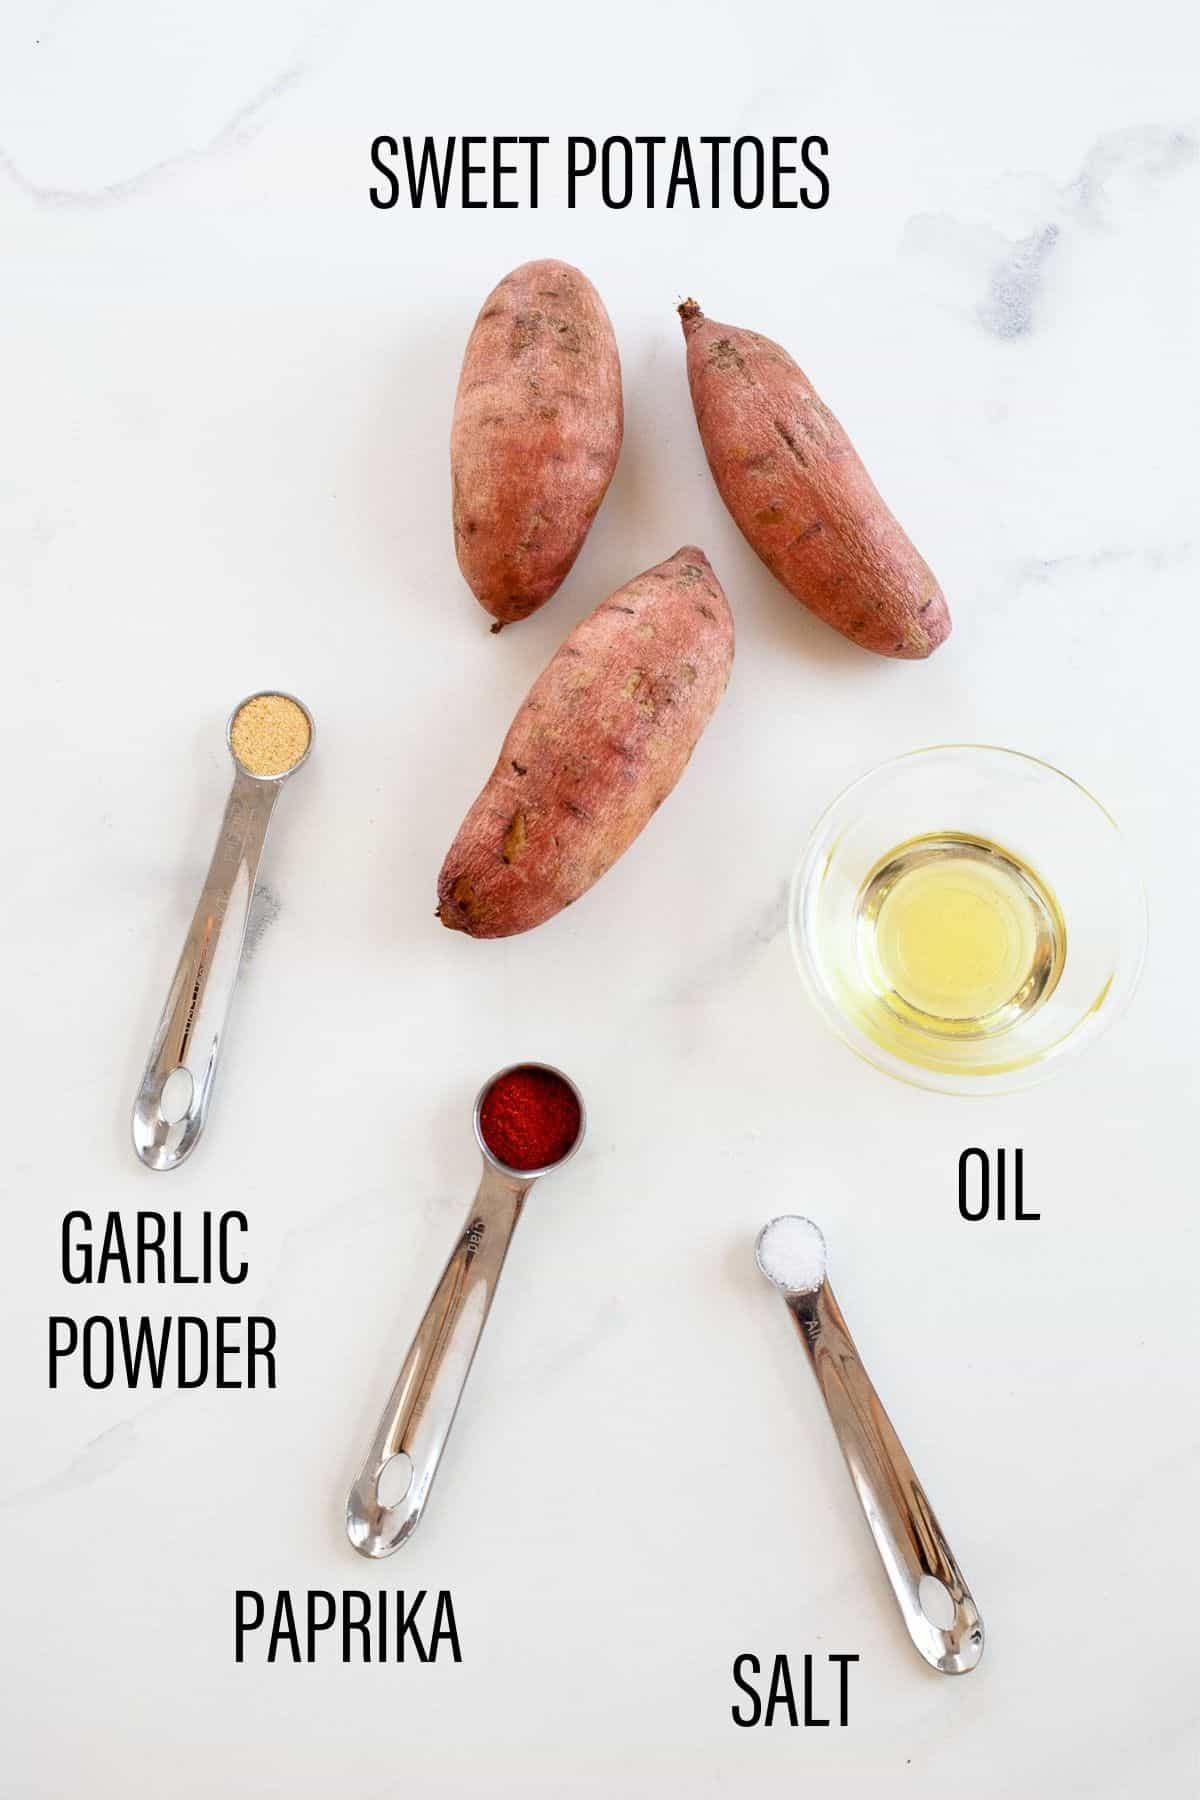 ingredients for air fryer sweet potato fries on white background garlic powder paprika three sweet potatoes